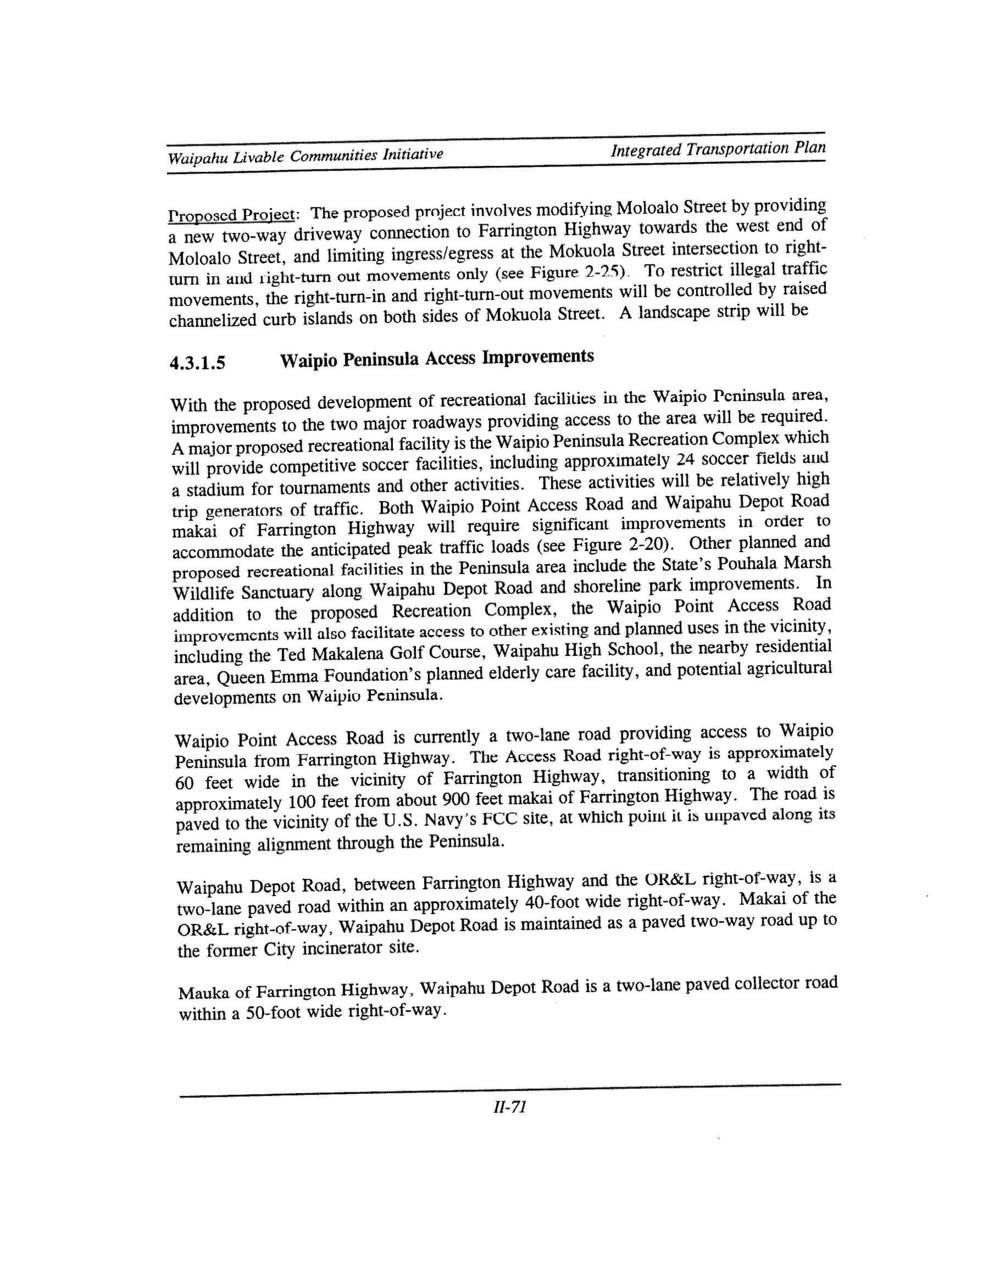 160531_WaipahuLivableCommunities(1998)_Page_086.jpg